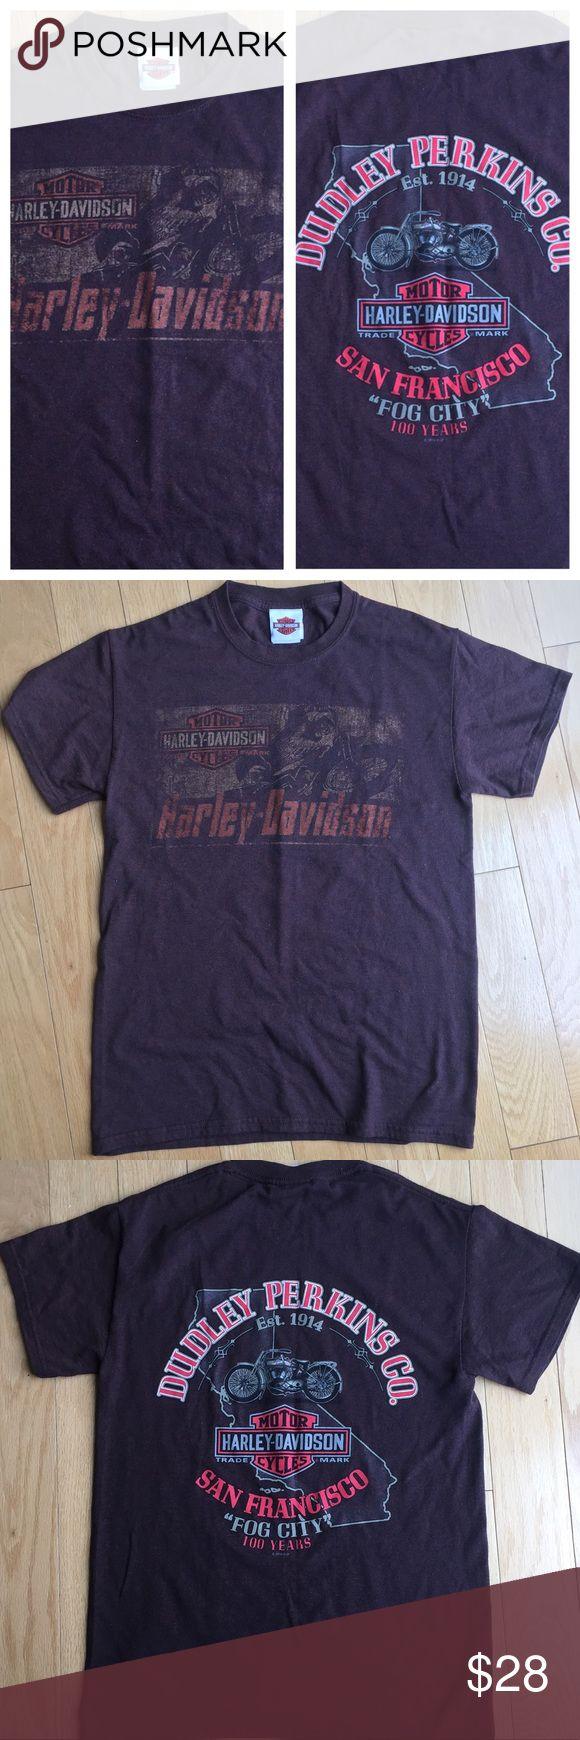 T shirt design on queen city - Harley Davidson Sf Fog City 100 Years T Shirt Brown Harley T Shirt With